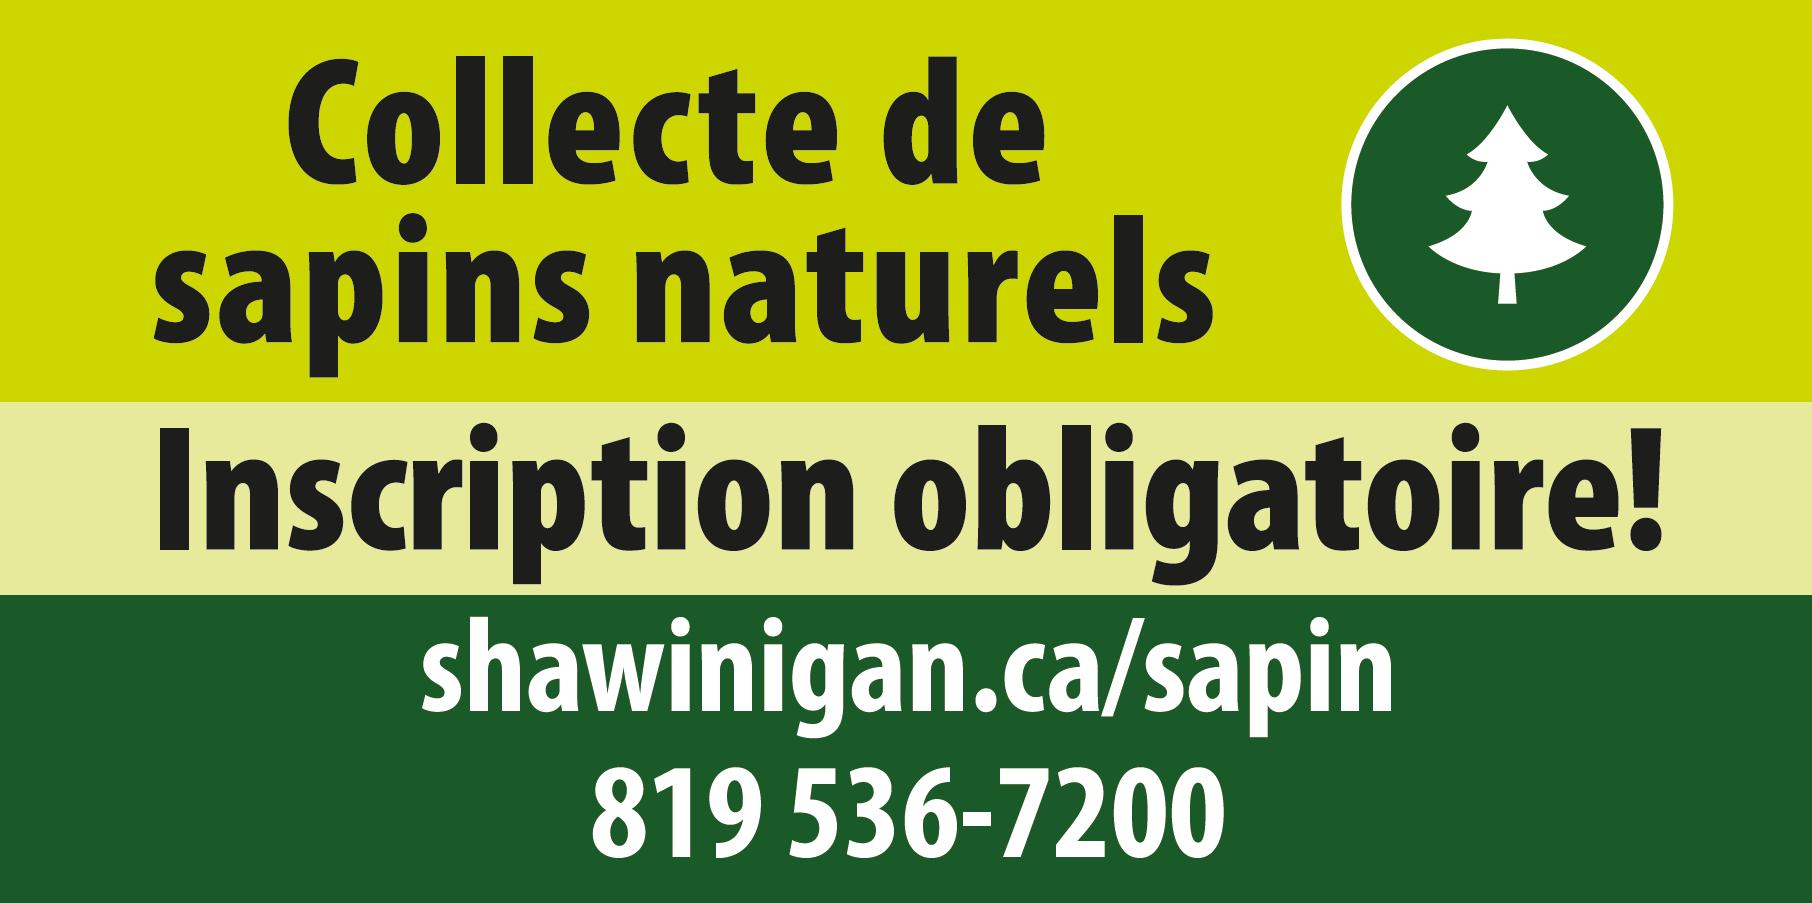 Affiche de colecte de sapins naturels